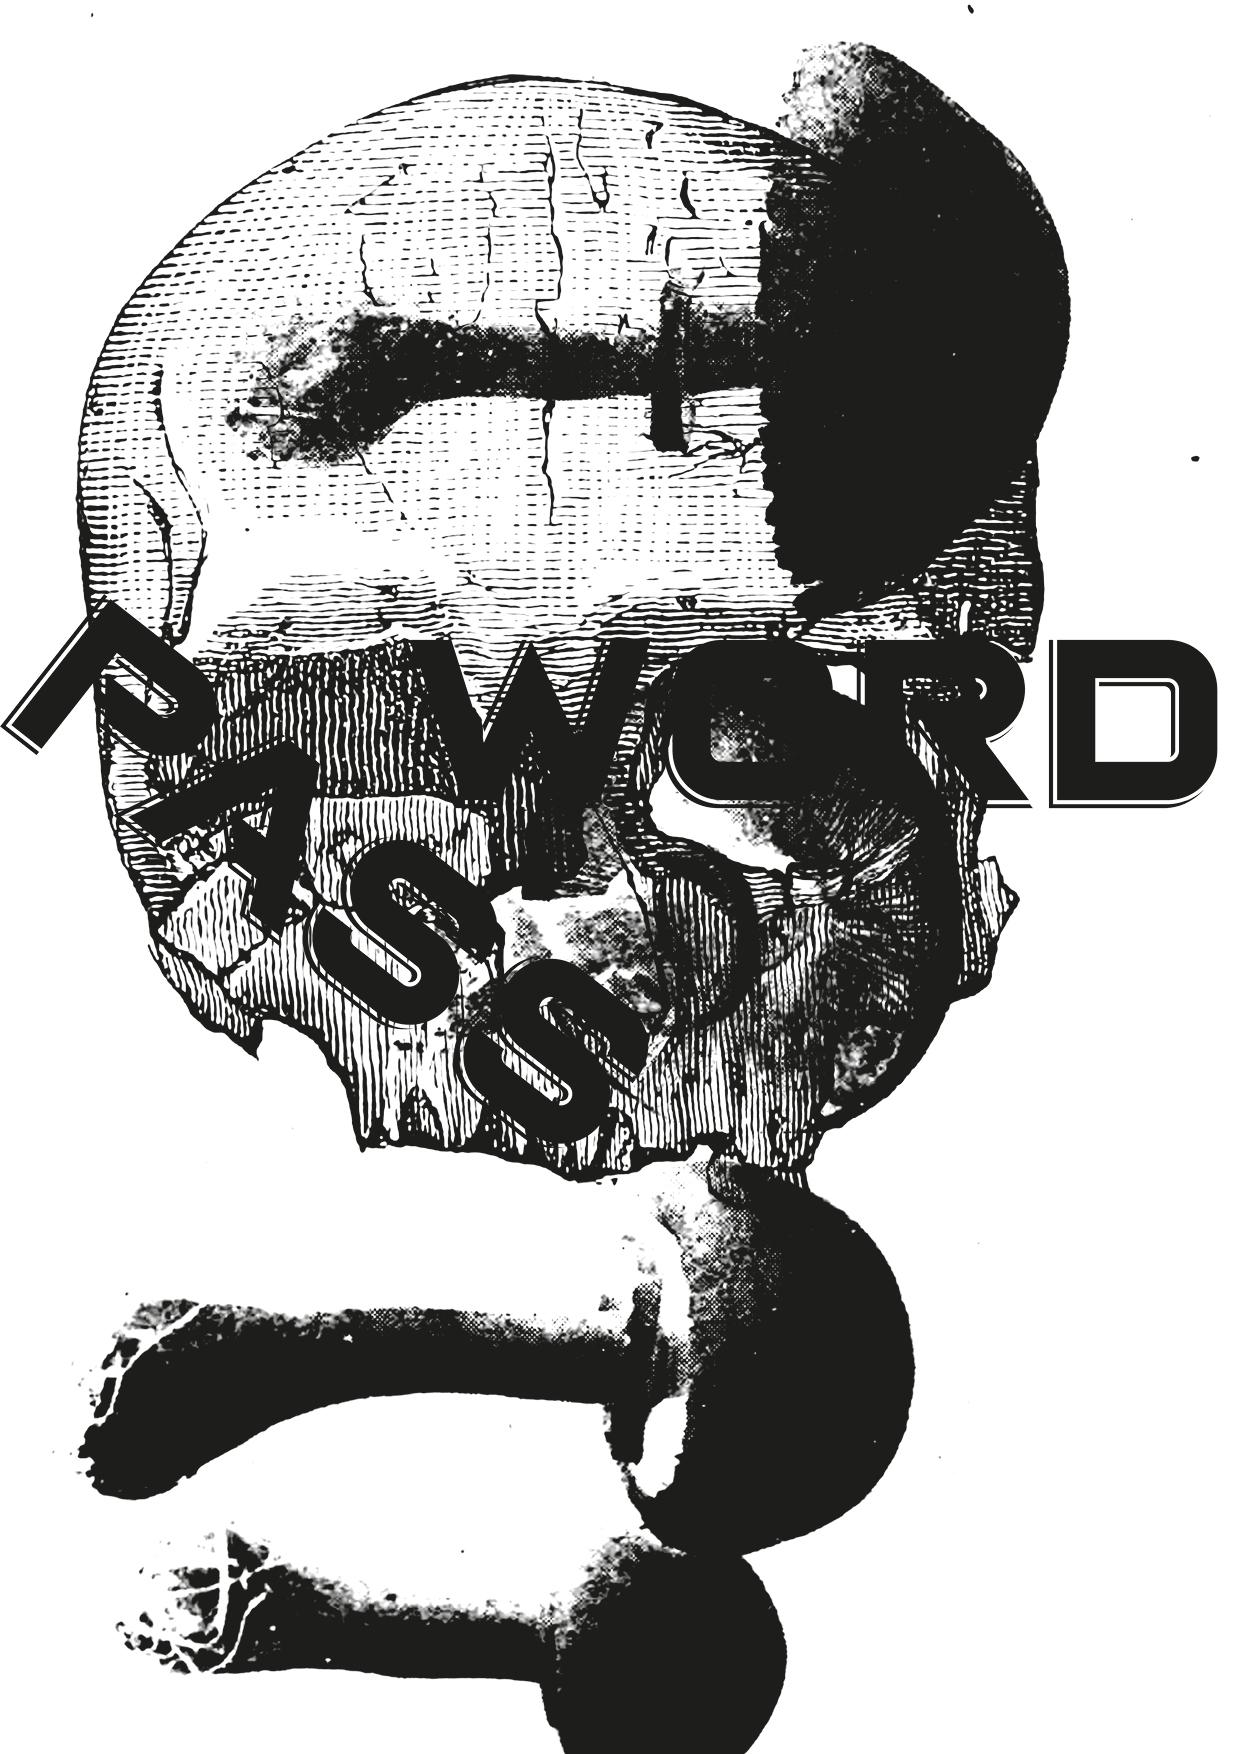 Unsubscribe-print-typography-design-James-Lee-Duffy6.jpg